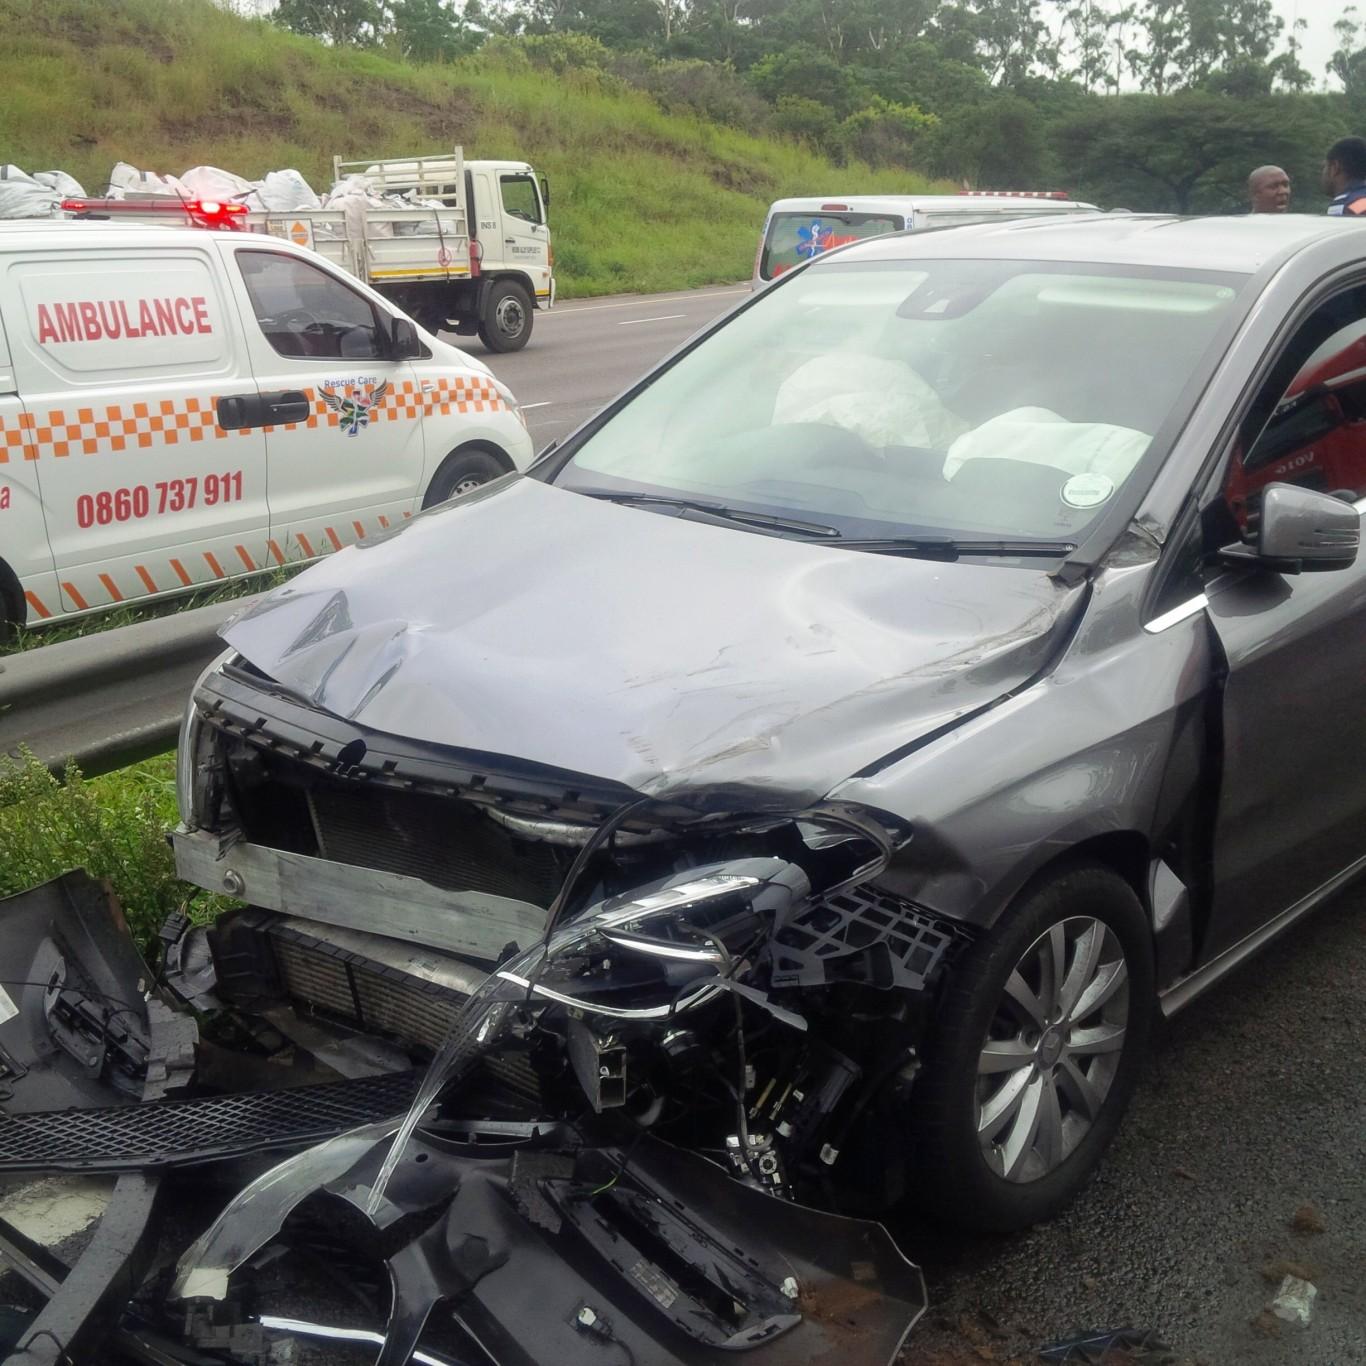 4 Injured in freeway crash in Durban